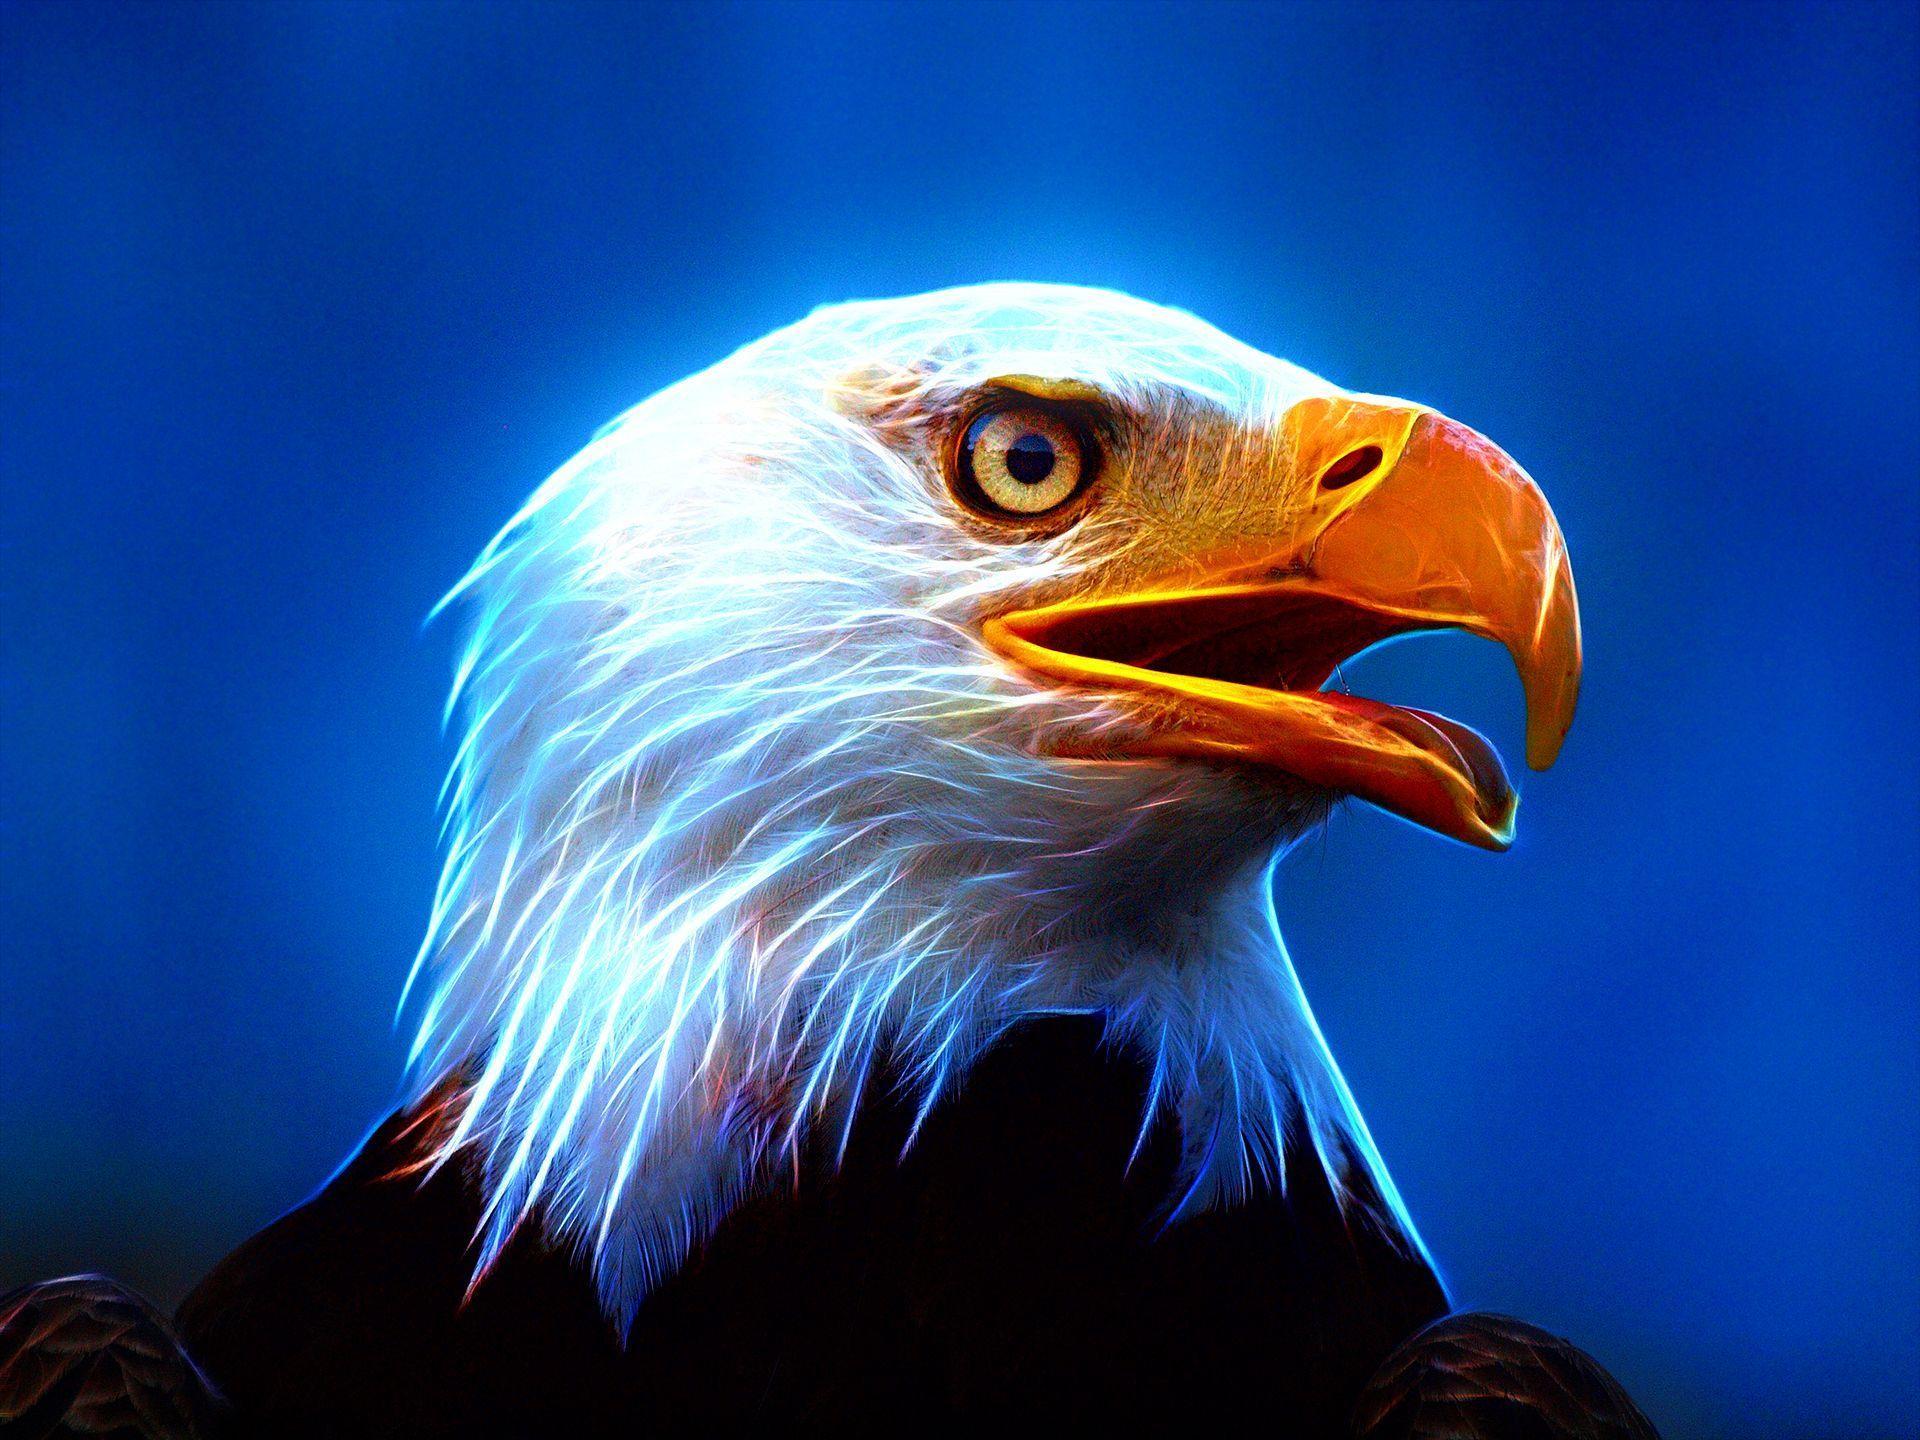 Download Fire Eagle Wallpaper Gallery Fondos De Pantalla